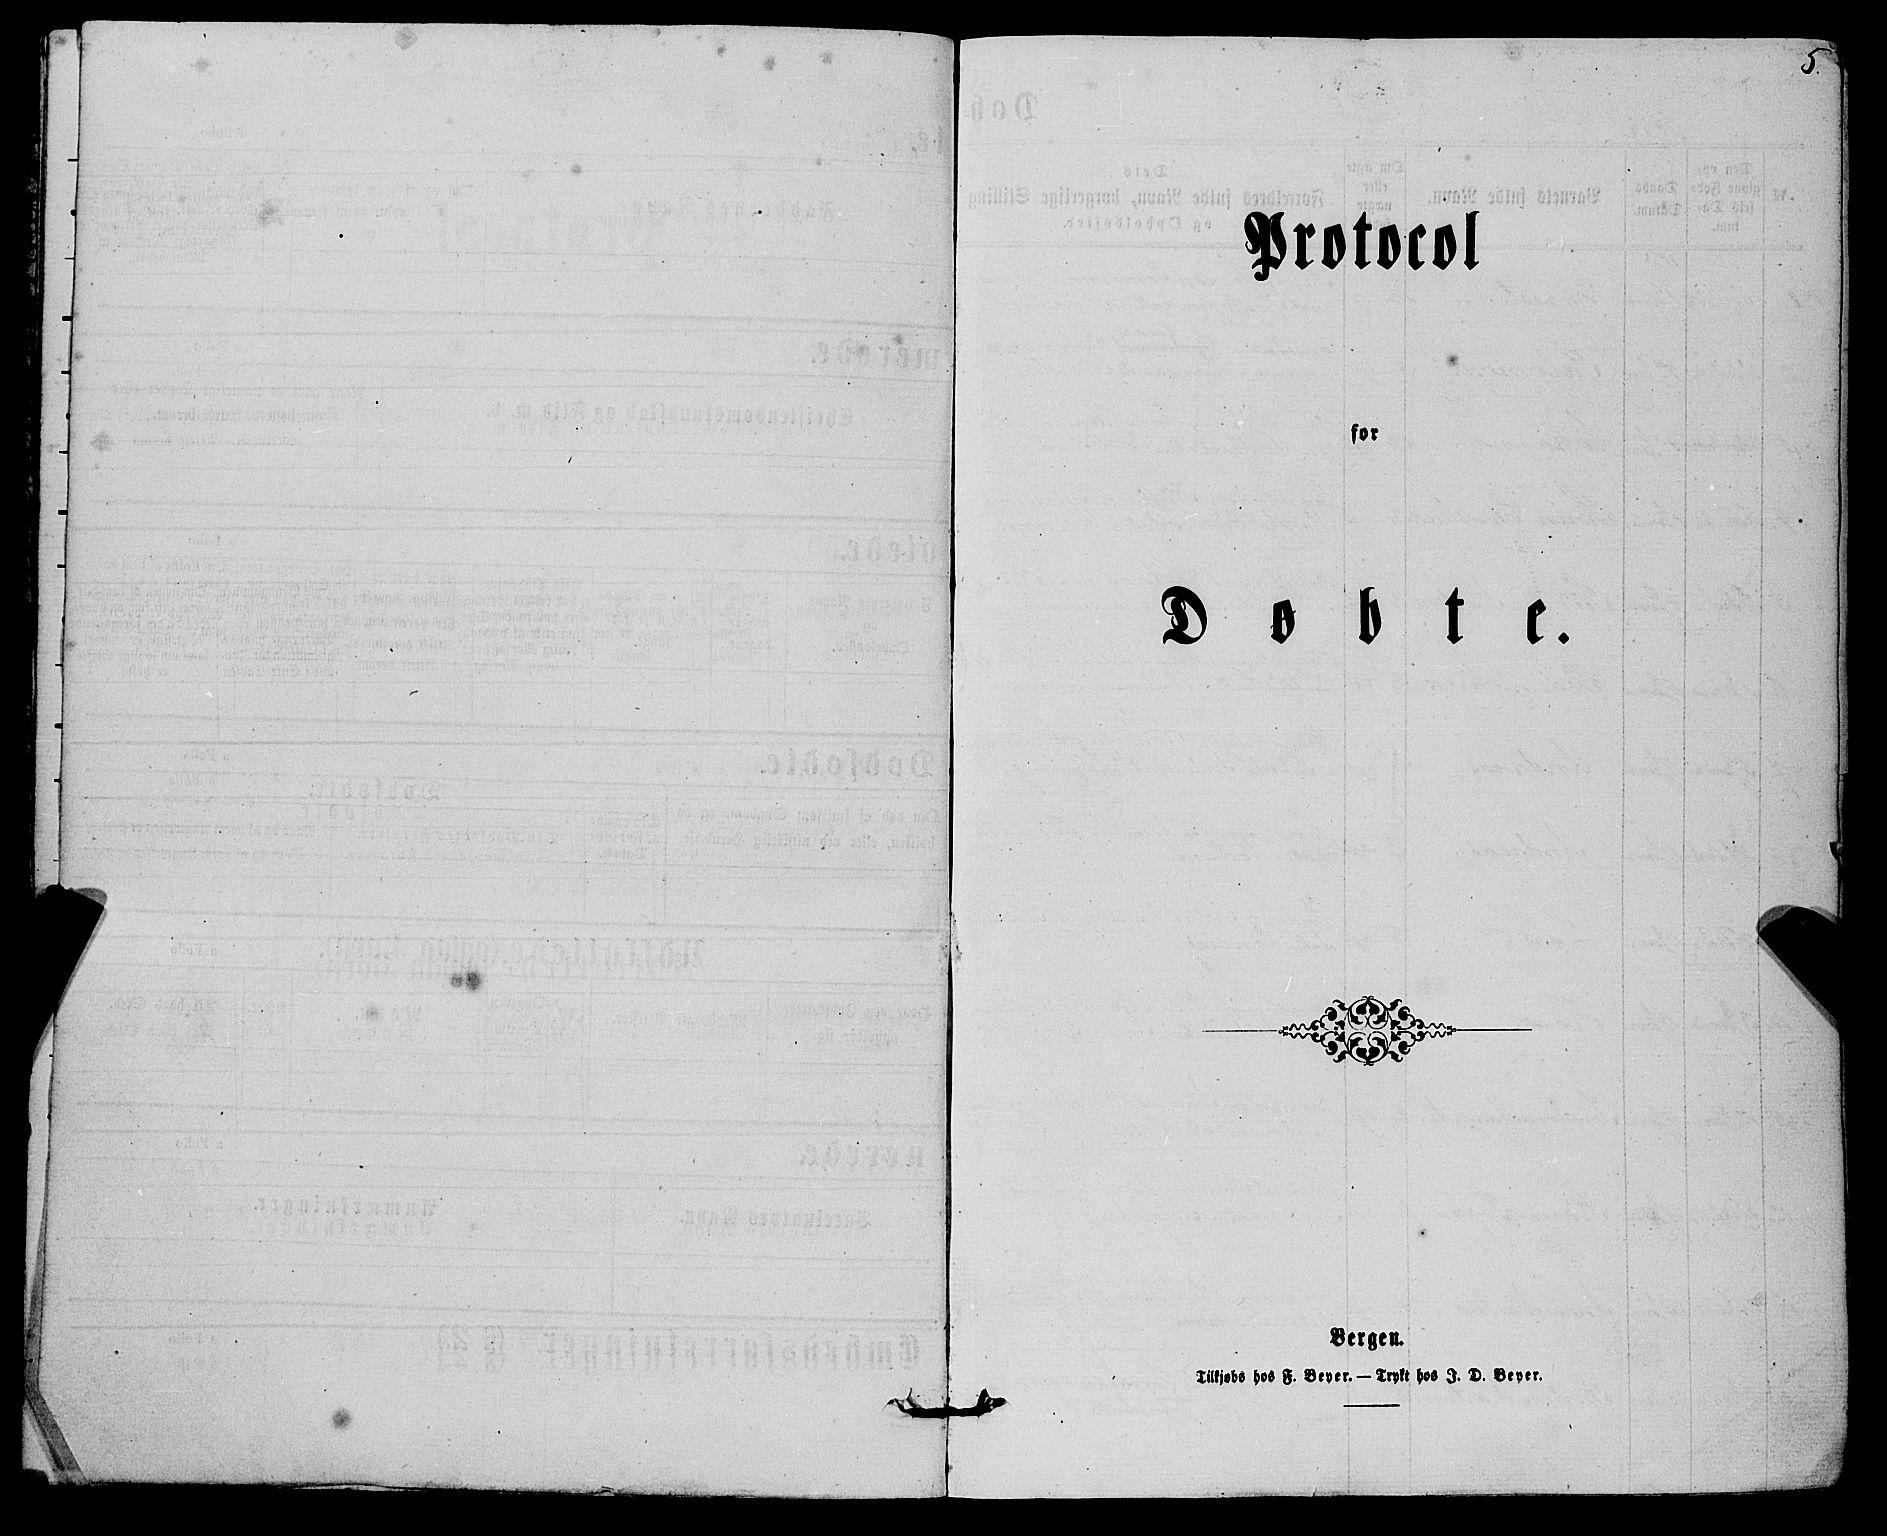 SAB, Finnås sokneprestembete, H/Ha/Haa/Haaa/L0008: Ministerialbok nr. A 8, 1863-1872, s. 5